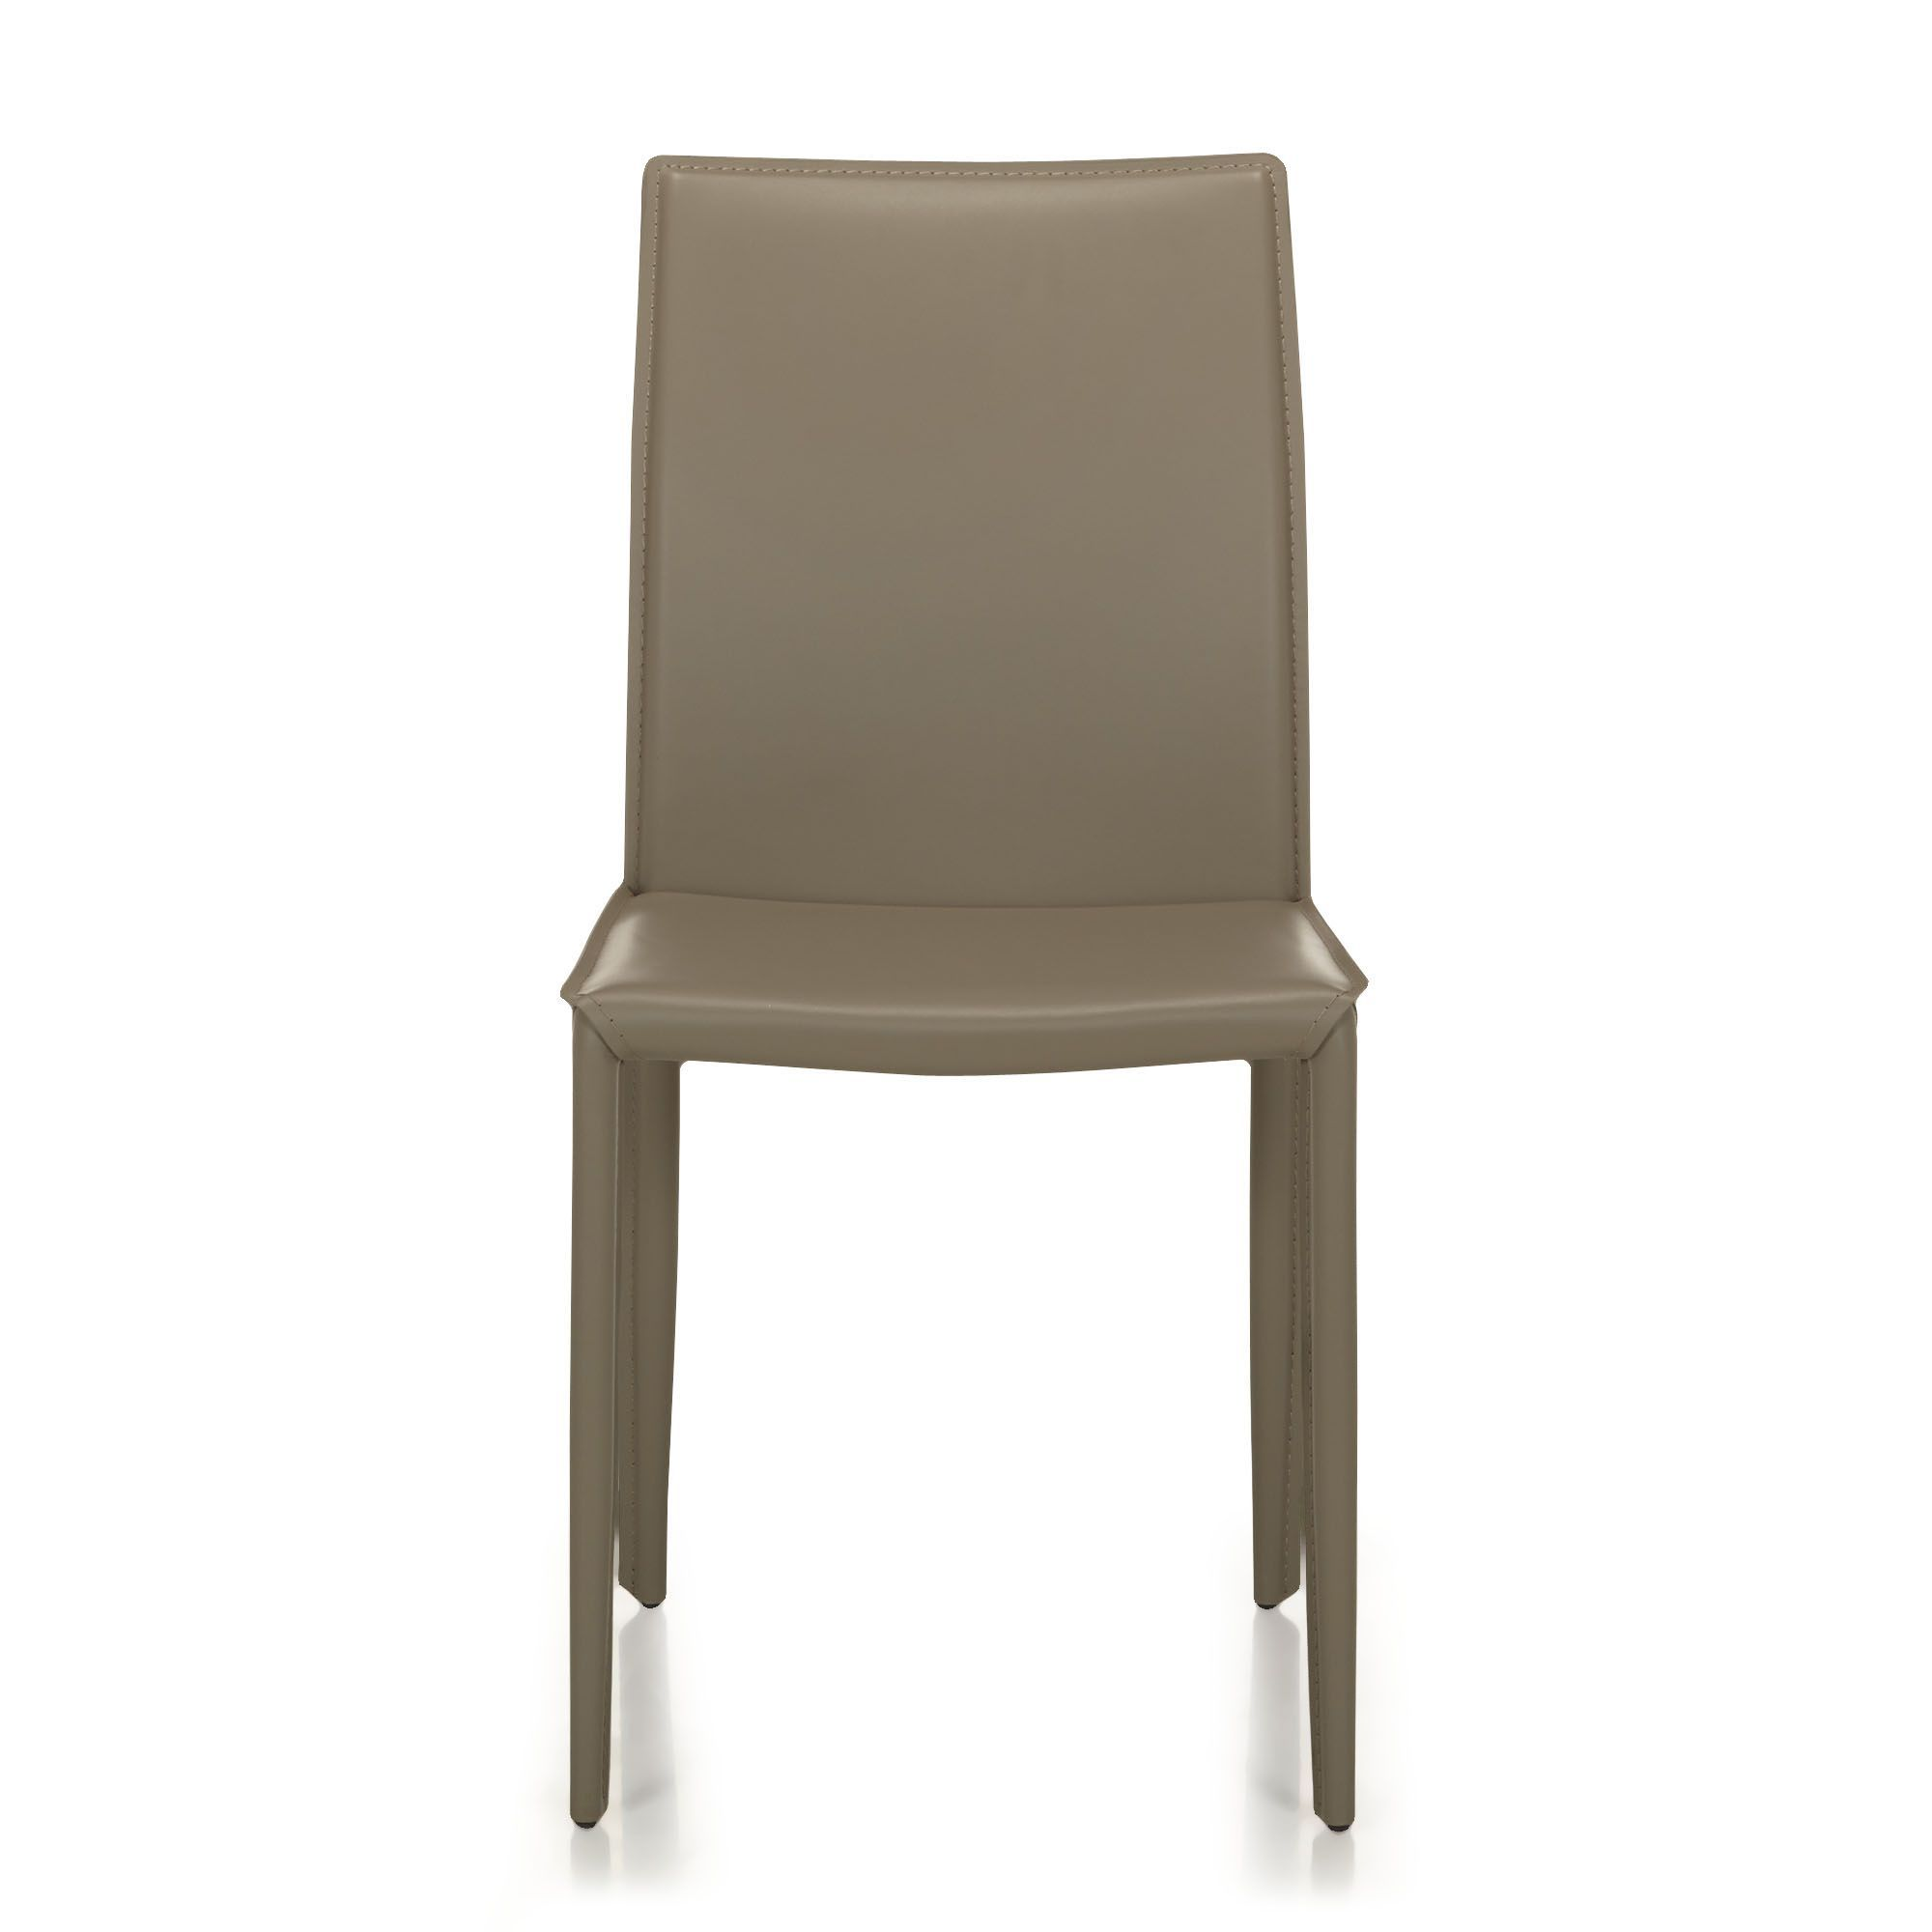 Chaise En Croute De Cuir Taupe Taupe Andrew Chaises Tables Et